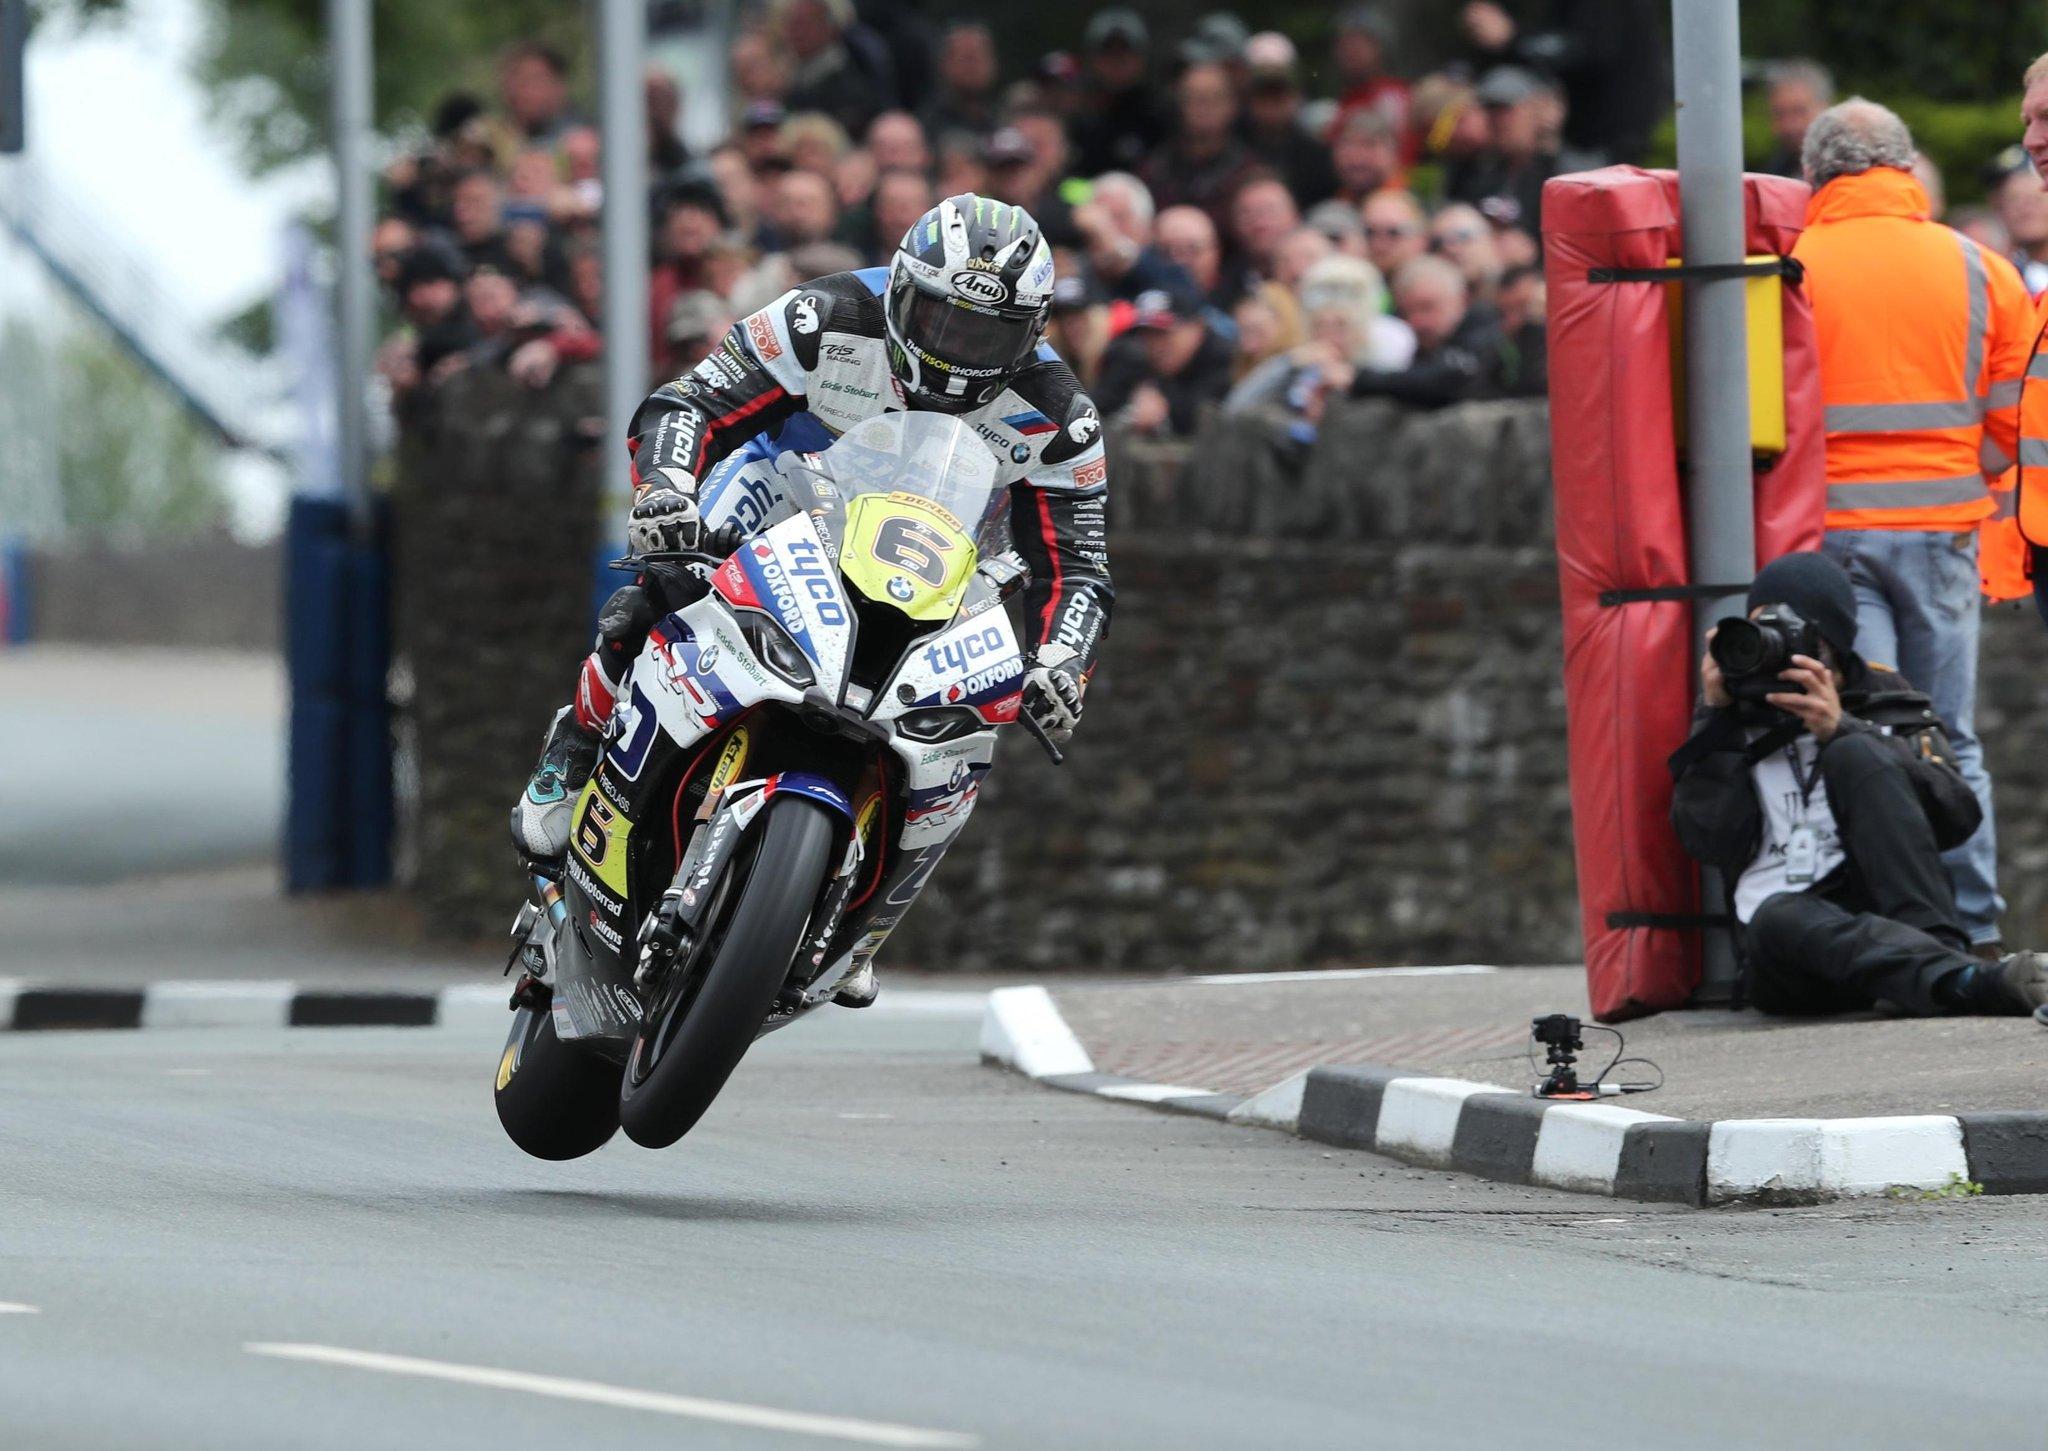 Michael Dunlop fires Isle of Man TT warning for 2022